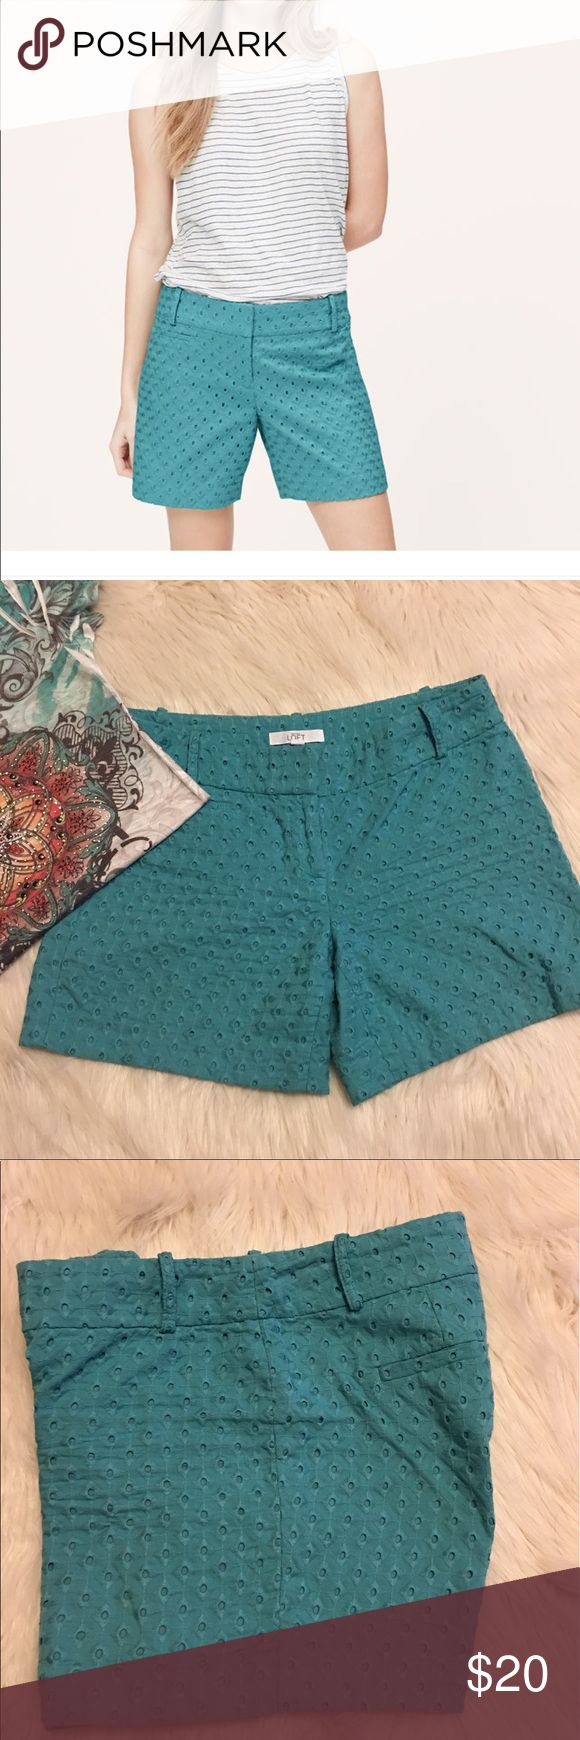 Ann Taylor LOFT Riviera Eyelet Shorts Size 4, in good condition, LOFT Diamond Eyelet Riviera shorts, color Deep Teal LOFT Shorts